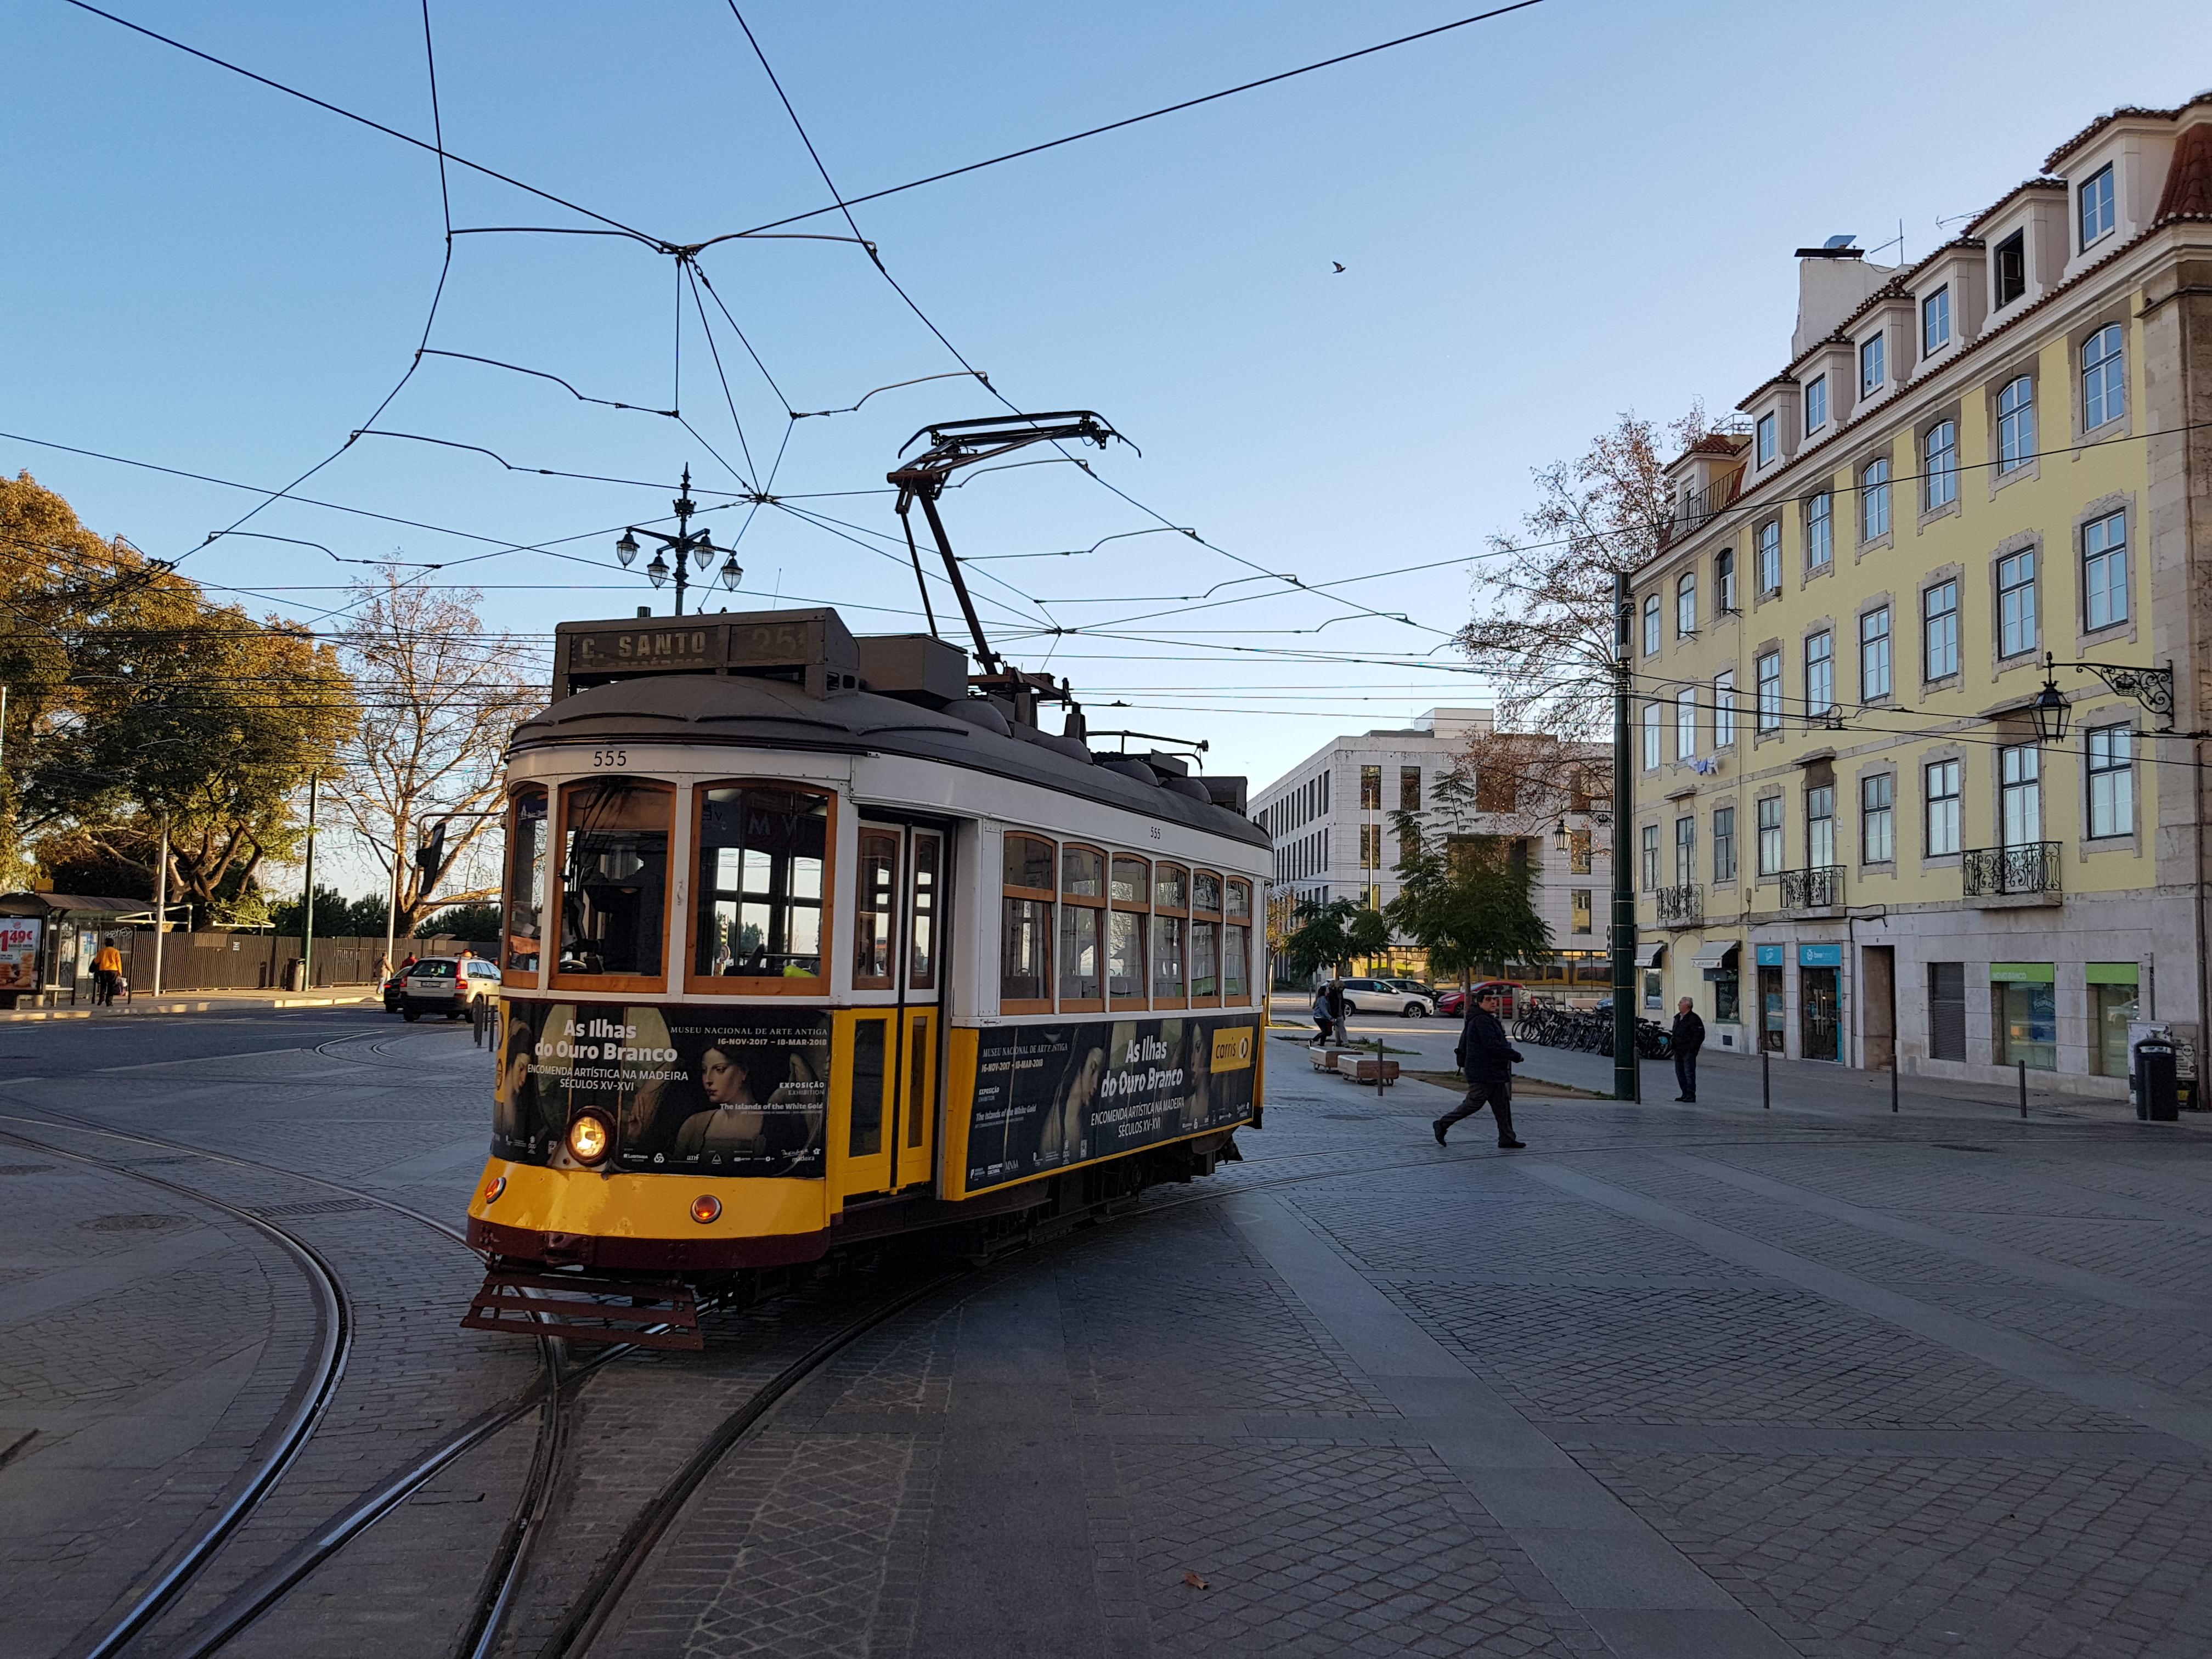 Lissabon (Portugal) 2018